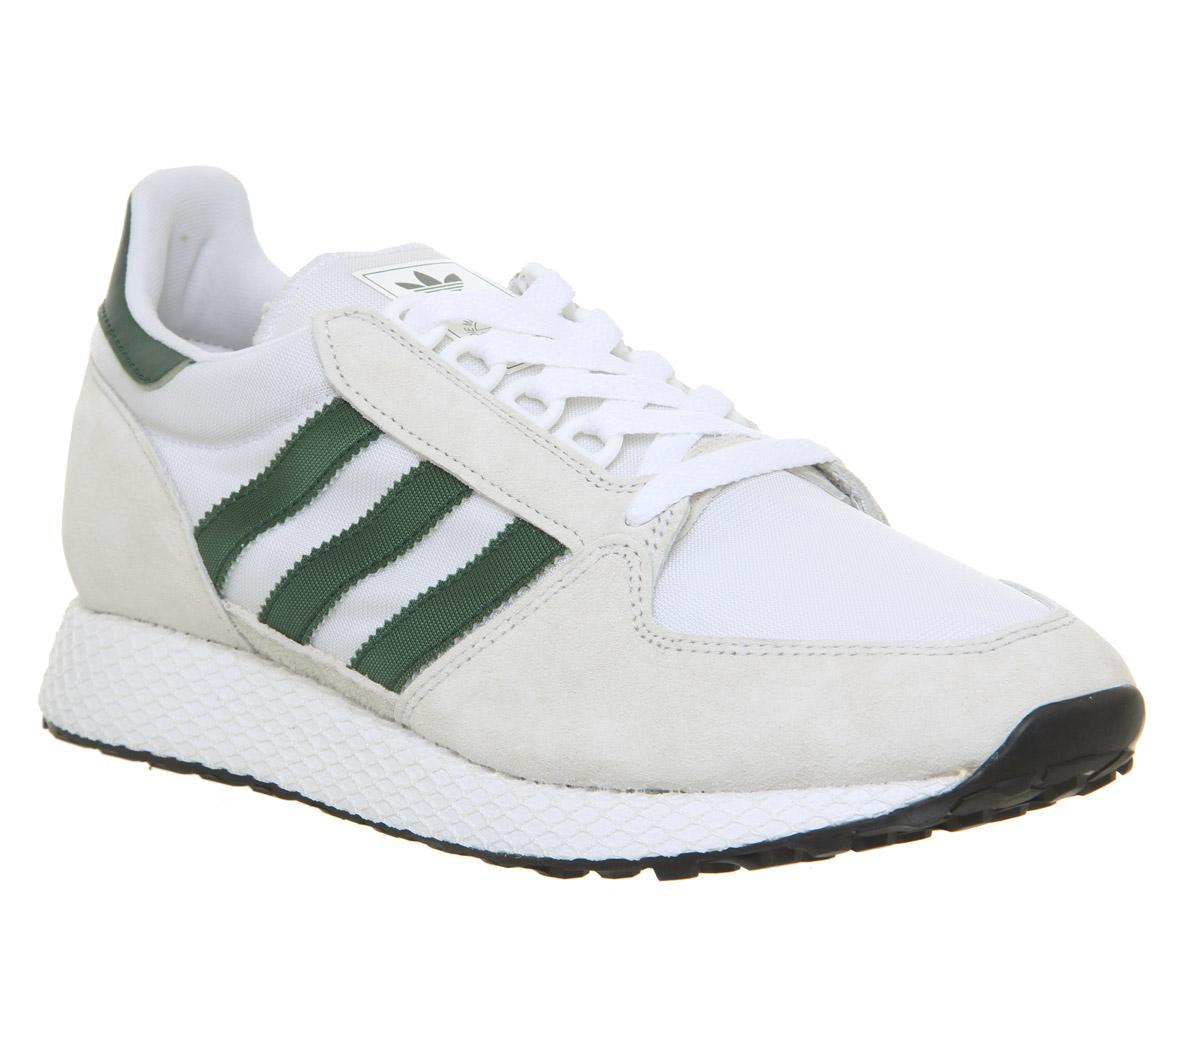 adidas originals Forest Grove crystal whitecollegiate green